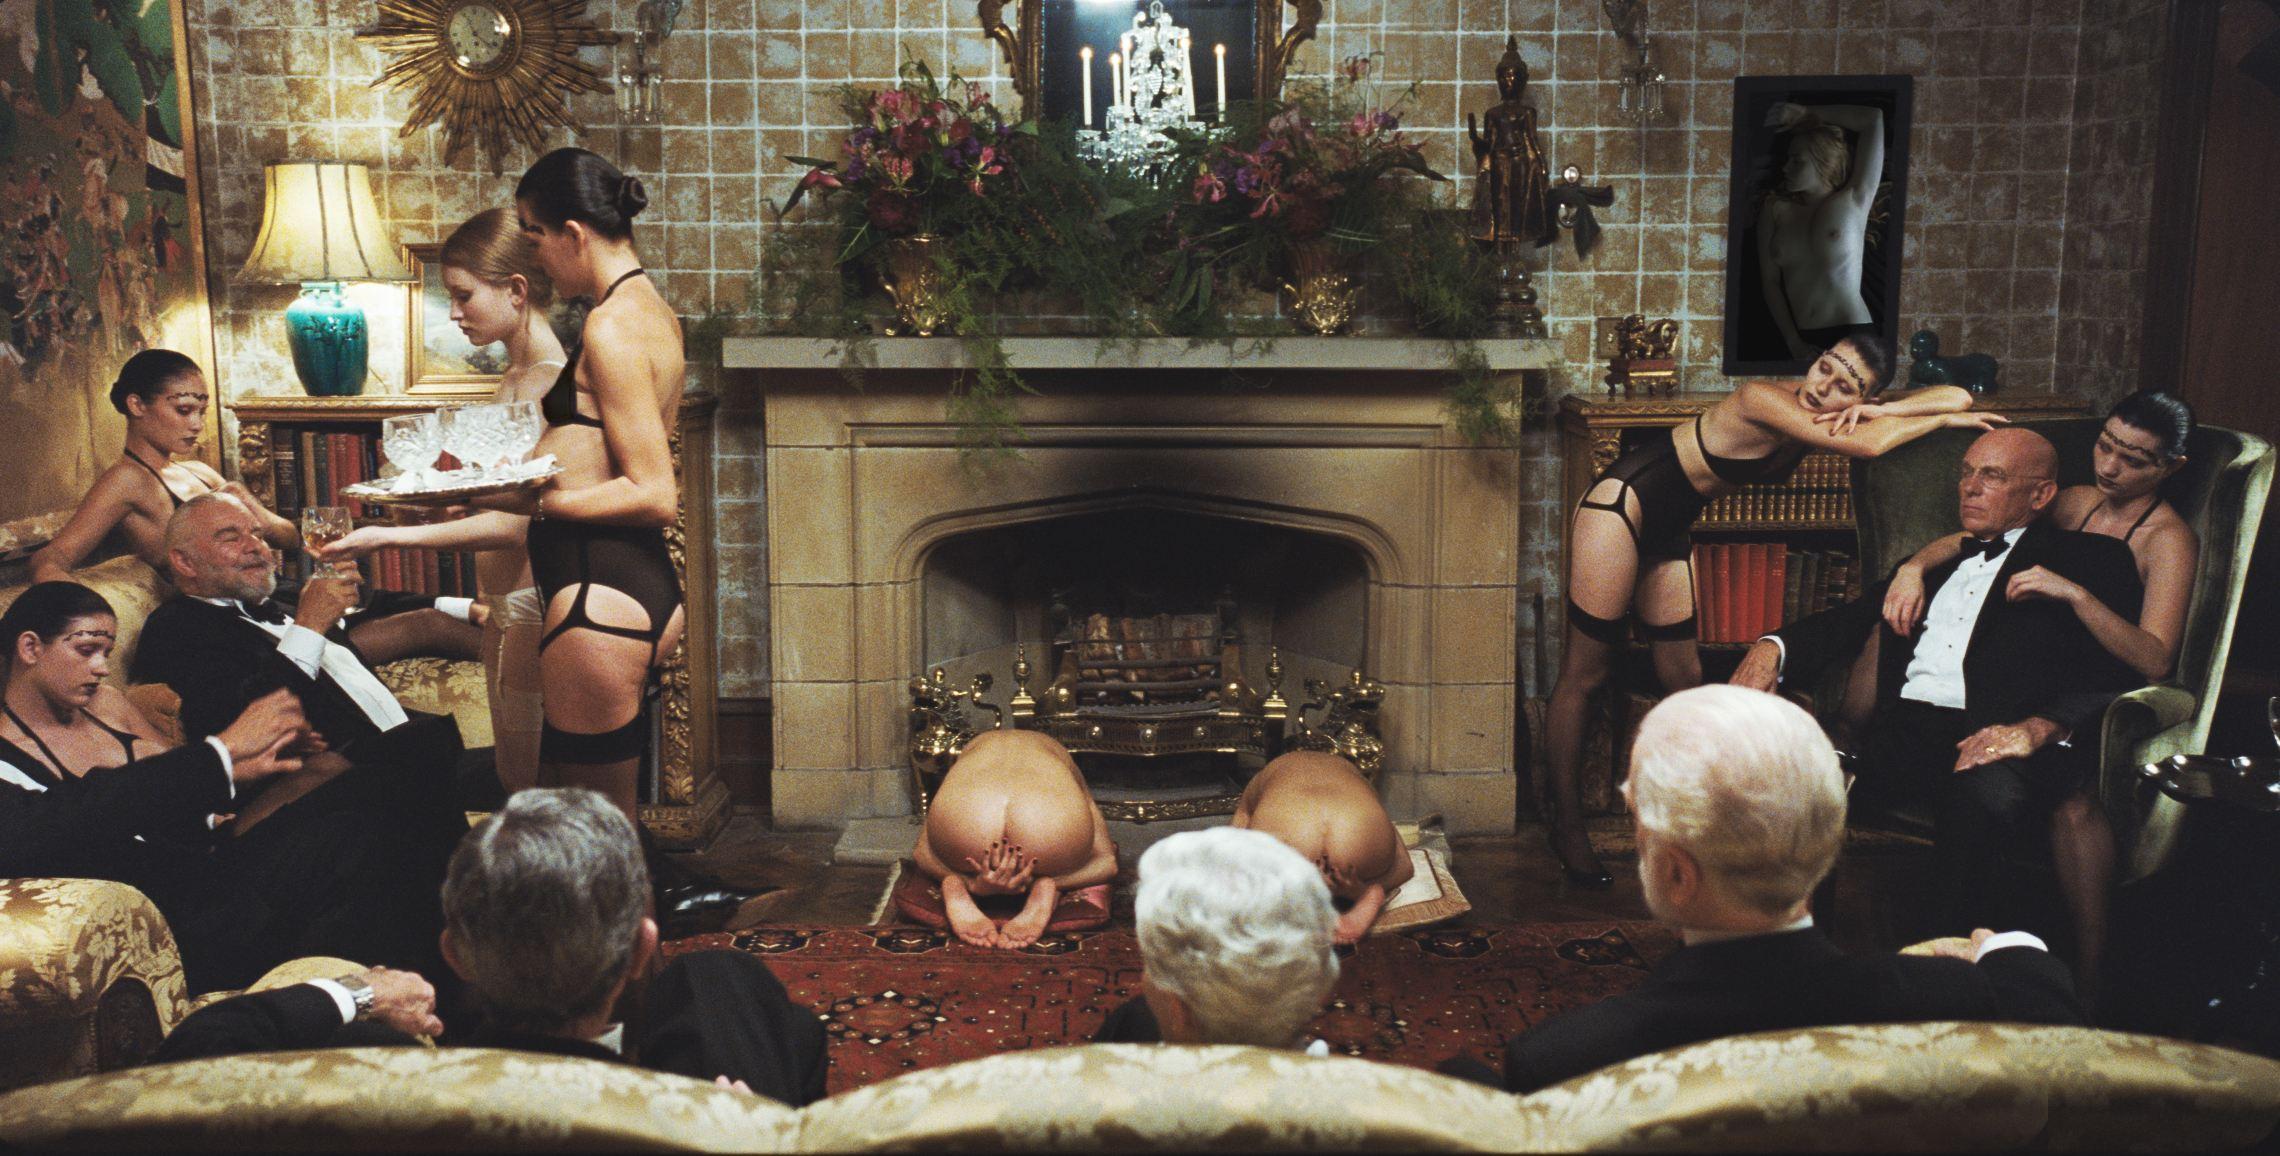 кадры из фильма Спящая красавица Эмили Браунинг,